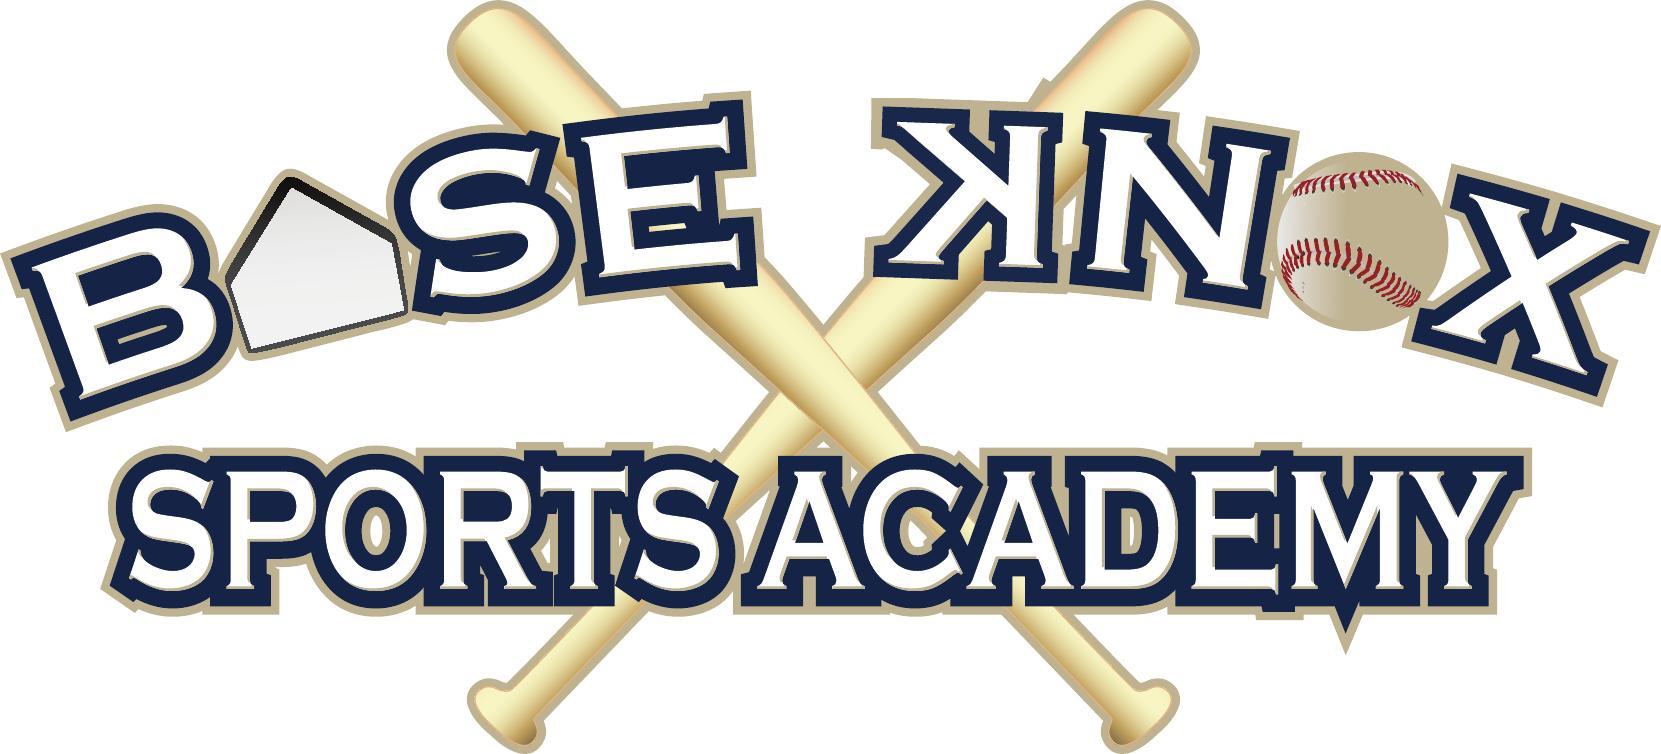 Base Knox Sports Academy